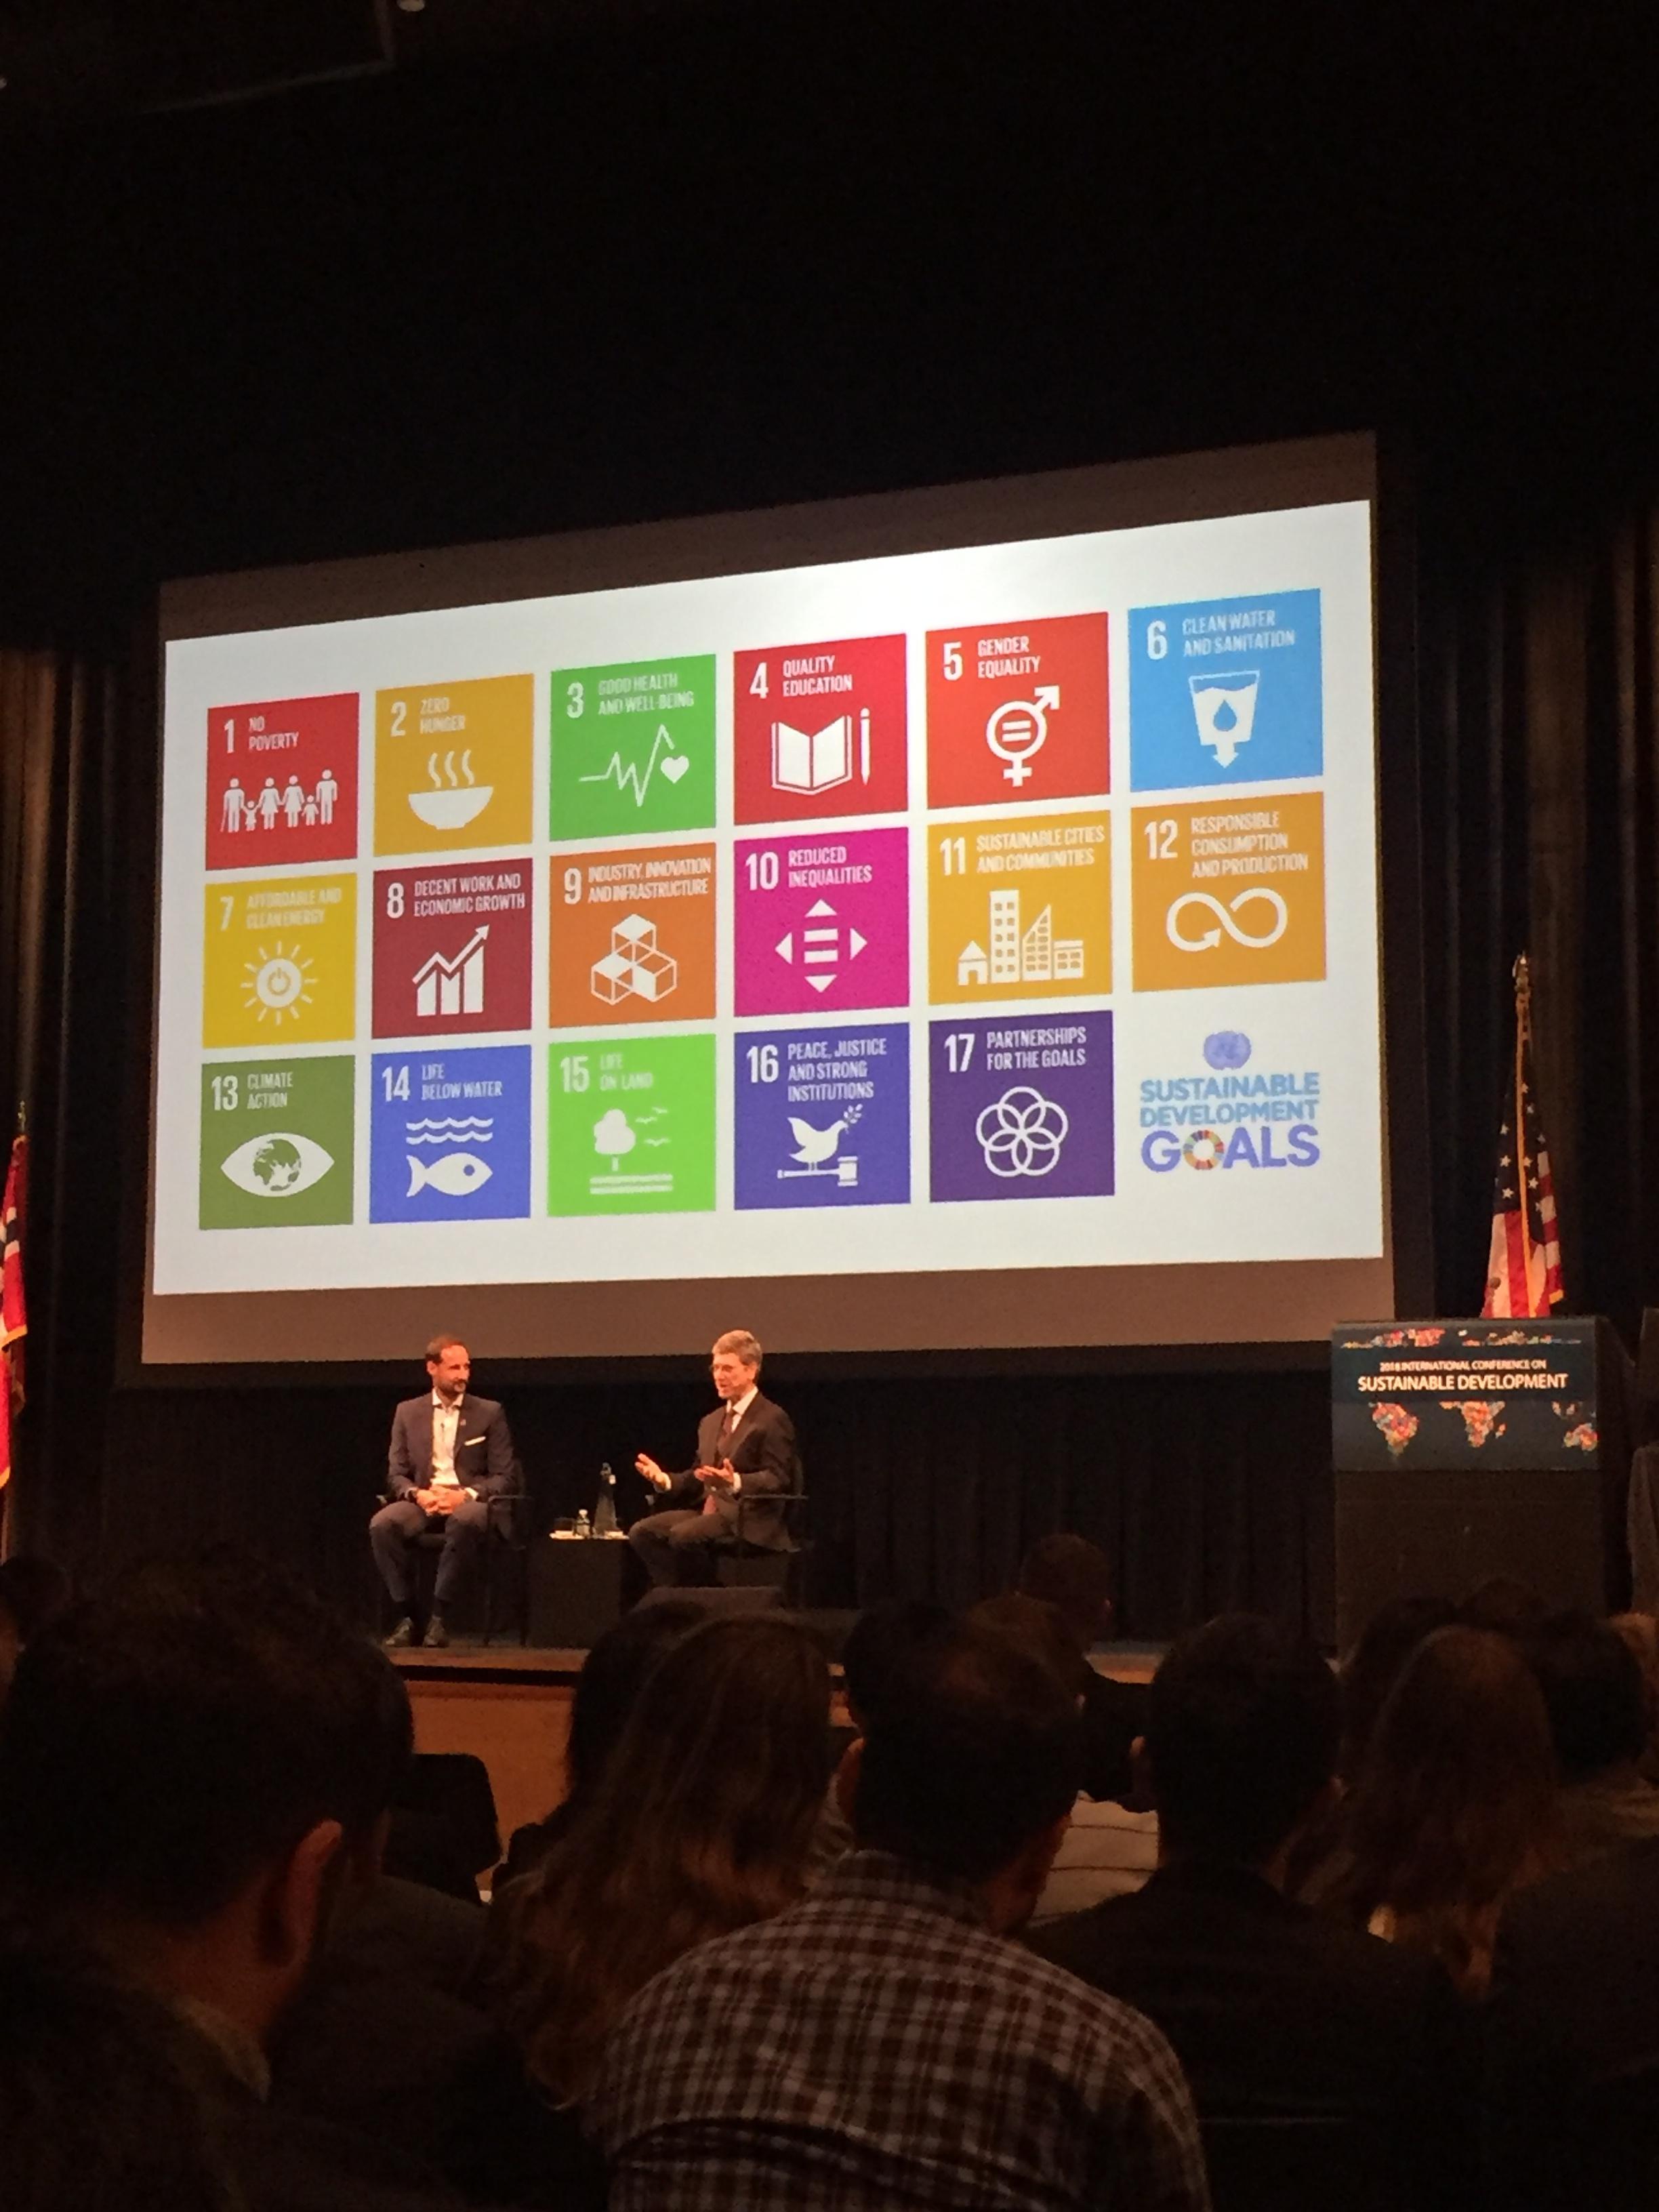 Professor Jeffrey Sachs interviews HRH Crown Prince Haakon after his keynote address at ICSD. Photo Credits: Sienna Nordquist